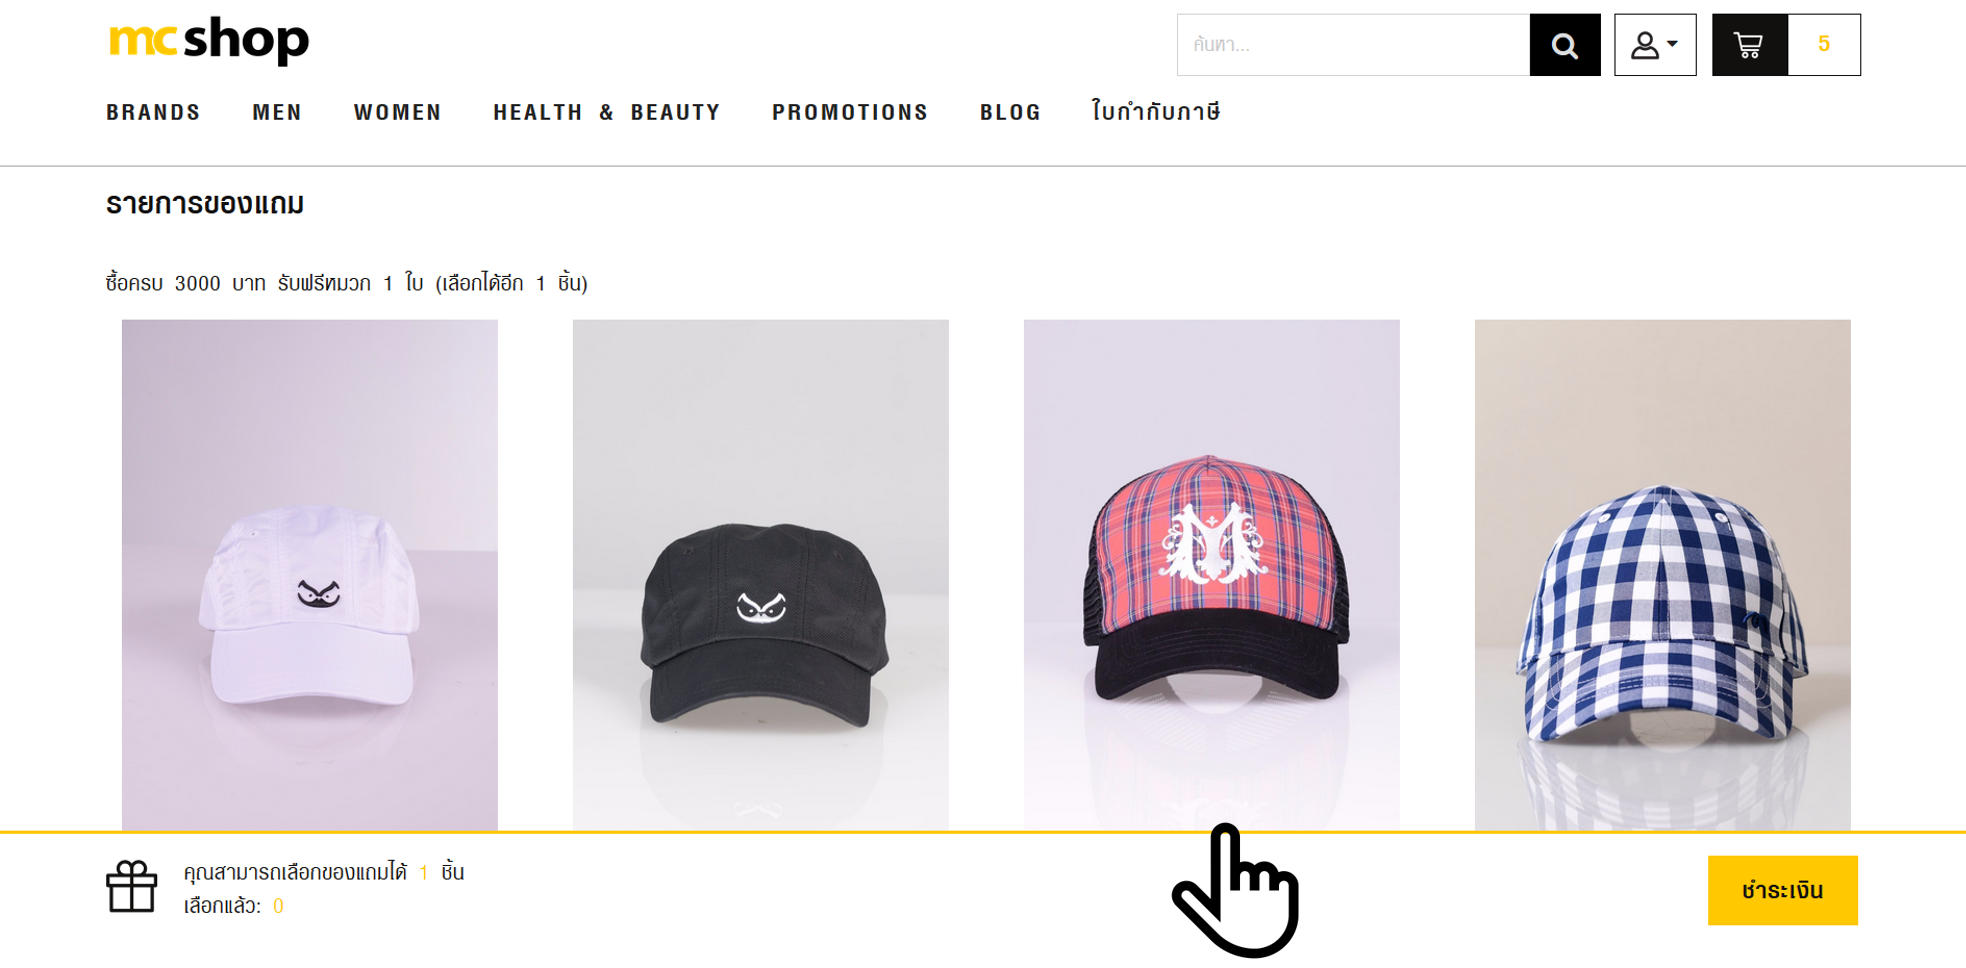 """Free Gift"" Feature ใหม่จาก mcshop ให้คุณเลือกของแถมได้เอง 6"